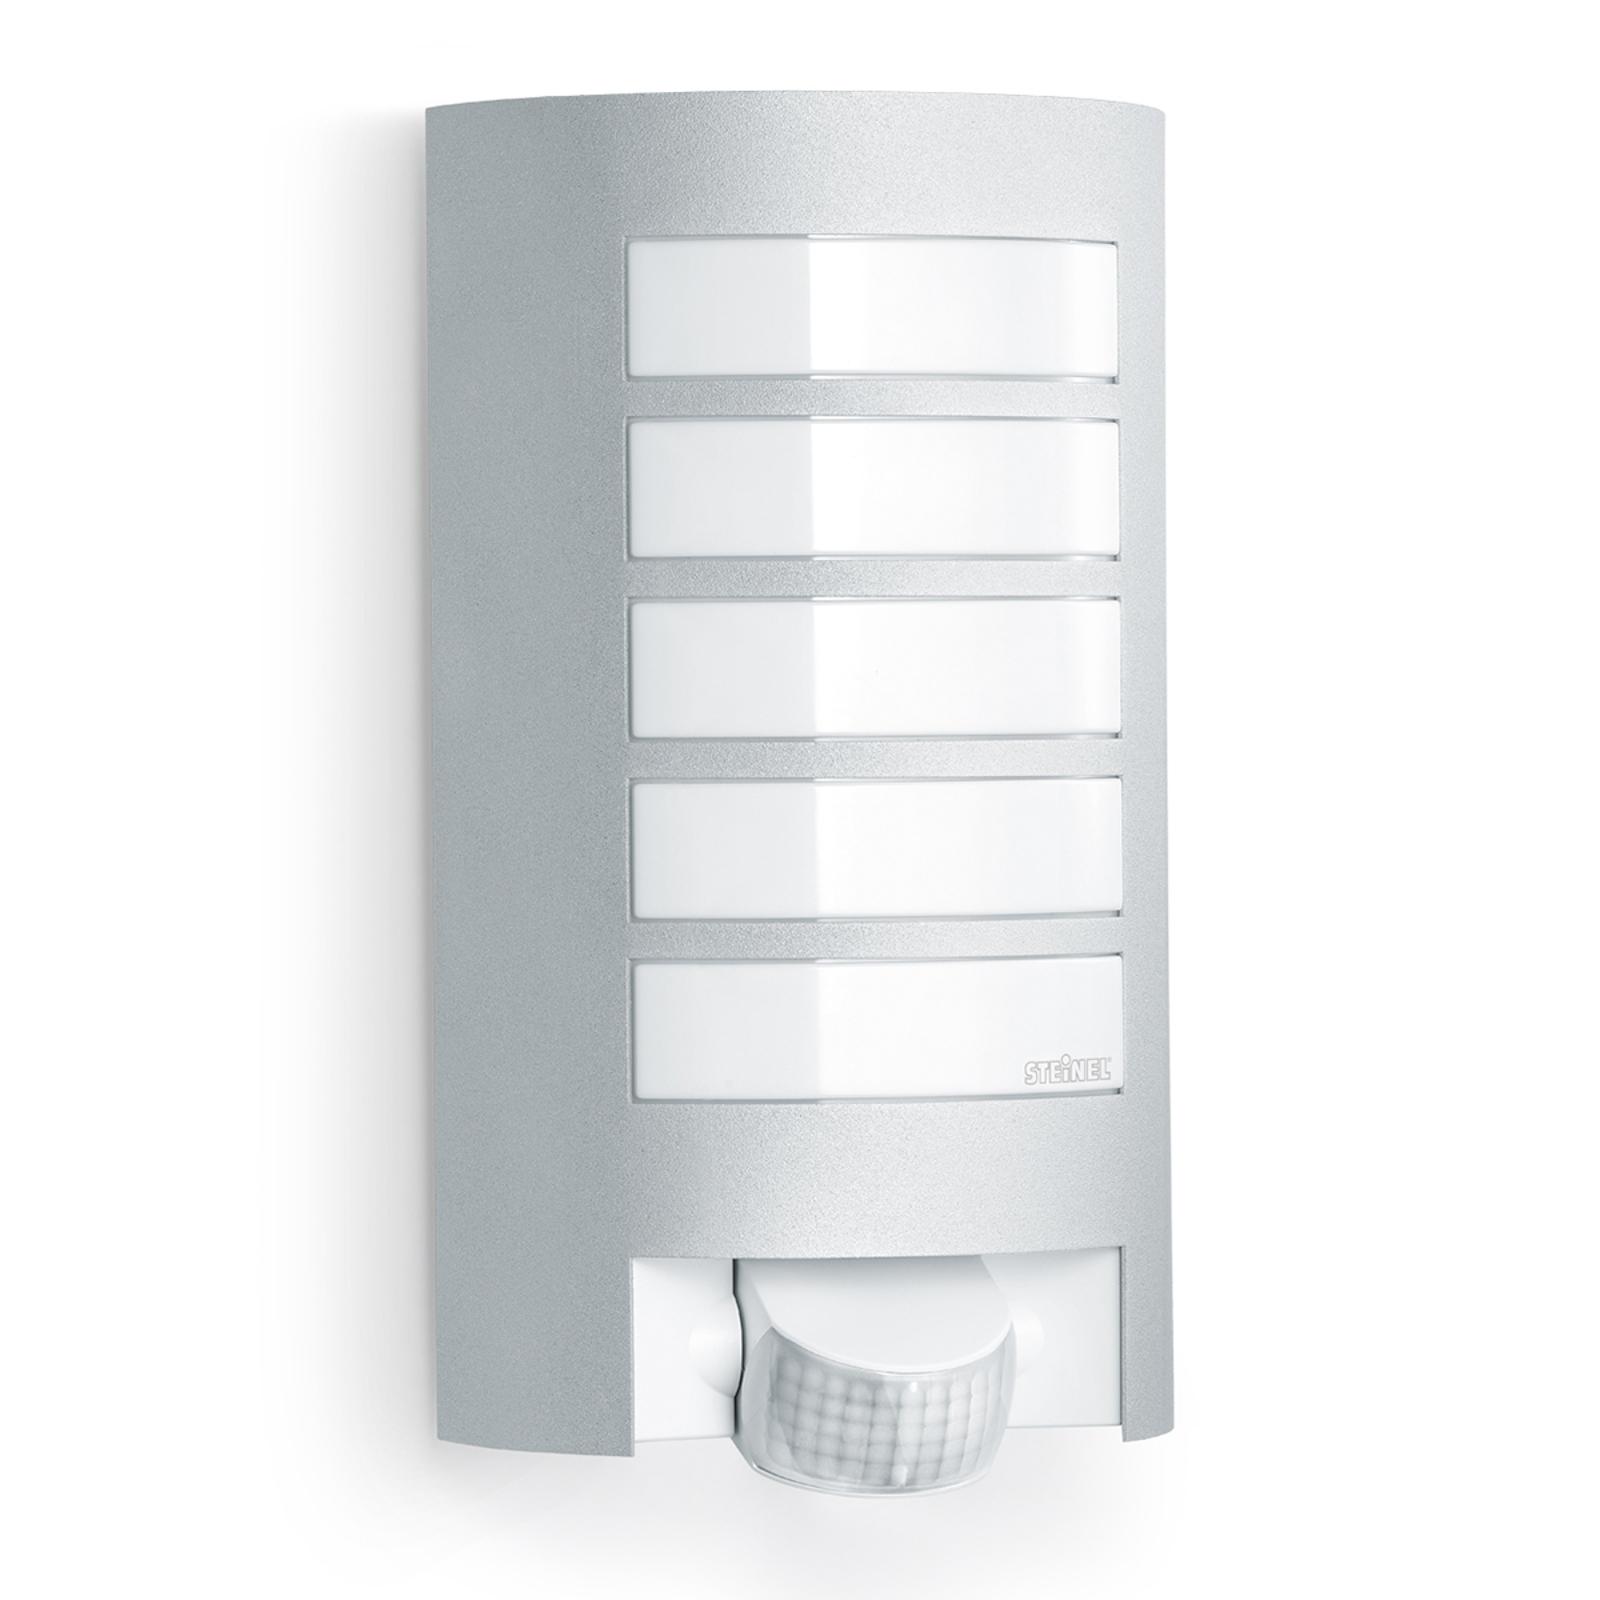 L12 sensor-vegglampe fra STEINEL